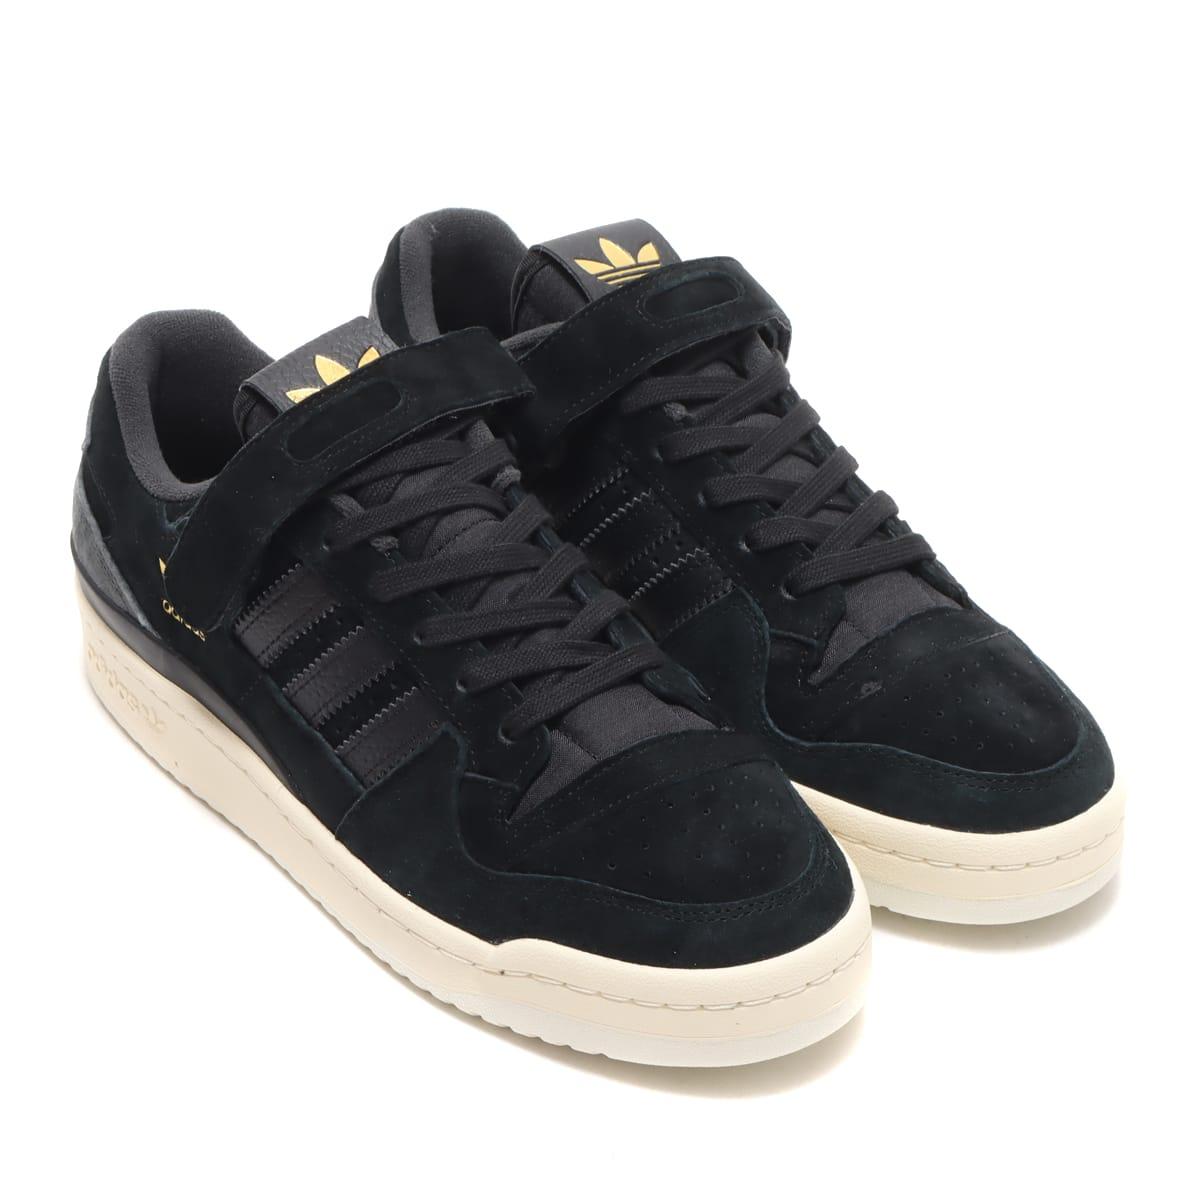 adidas FORUM 84 LOW CORE BLACK/CREAM WHITE/CARBON 21FW-I_photo_large